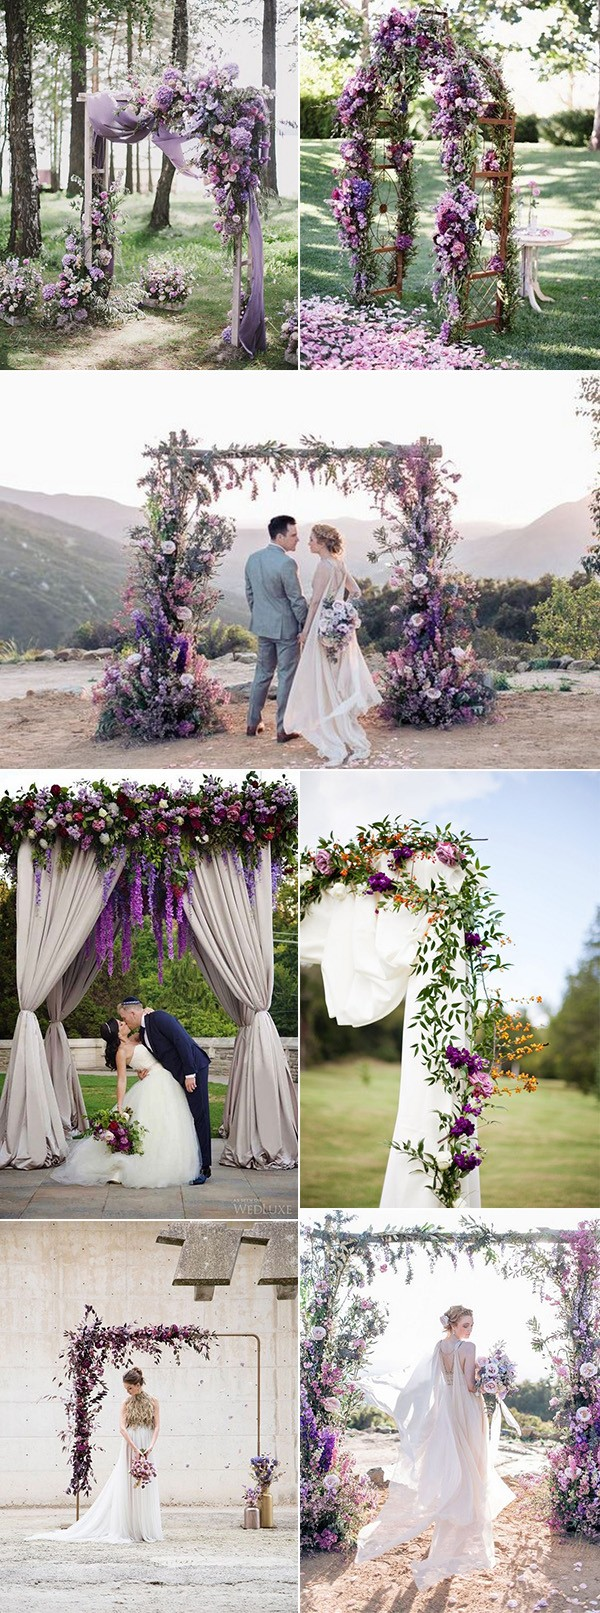 shades of purple wedding arches